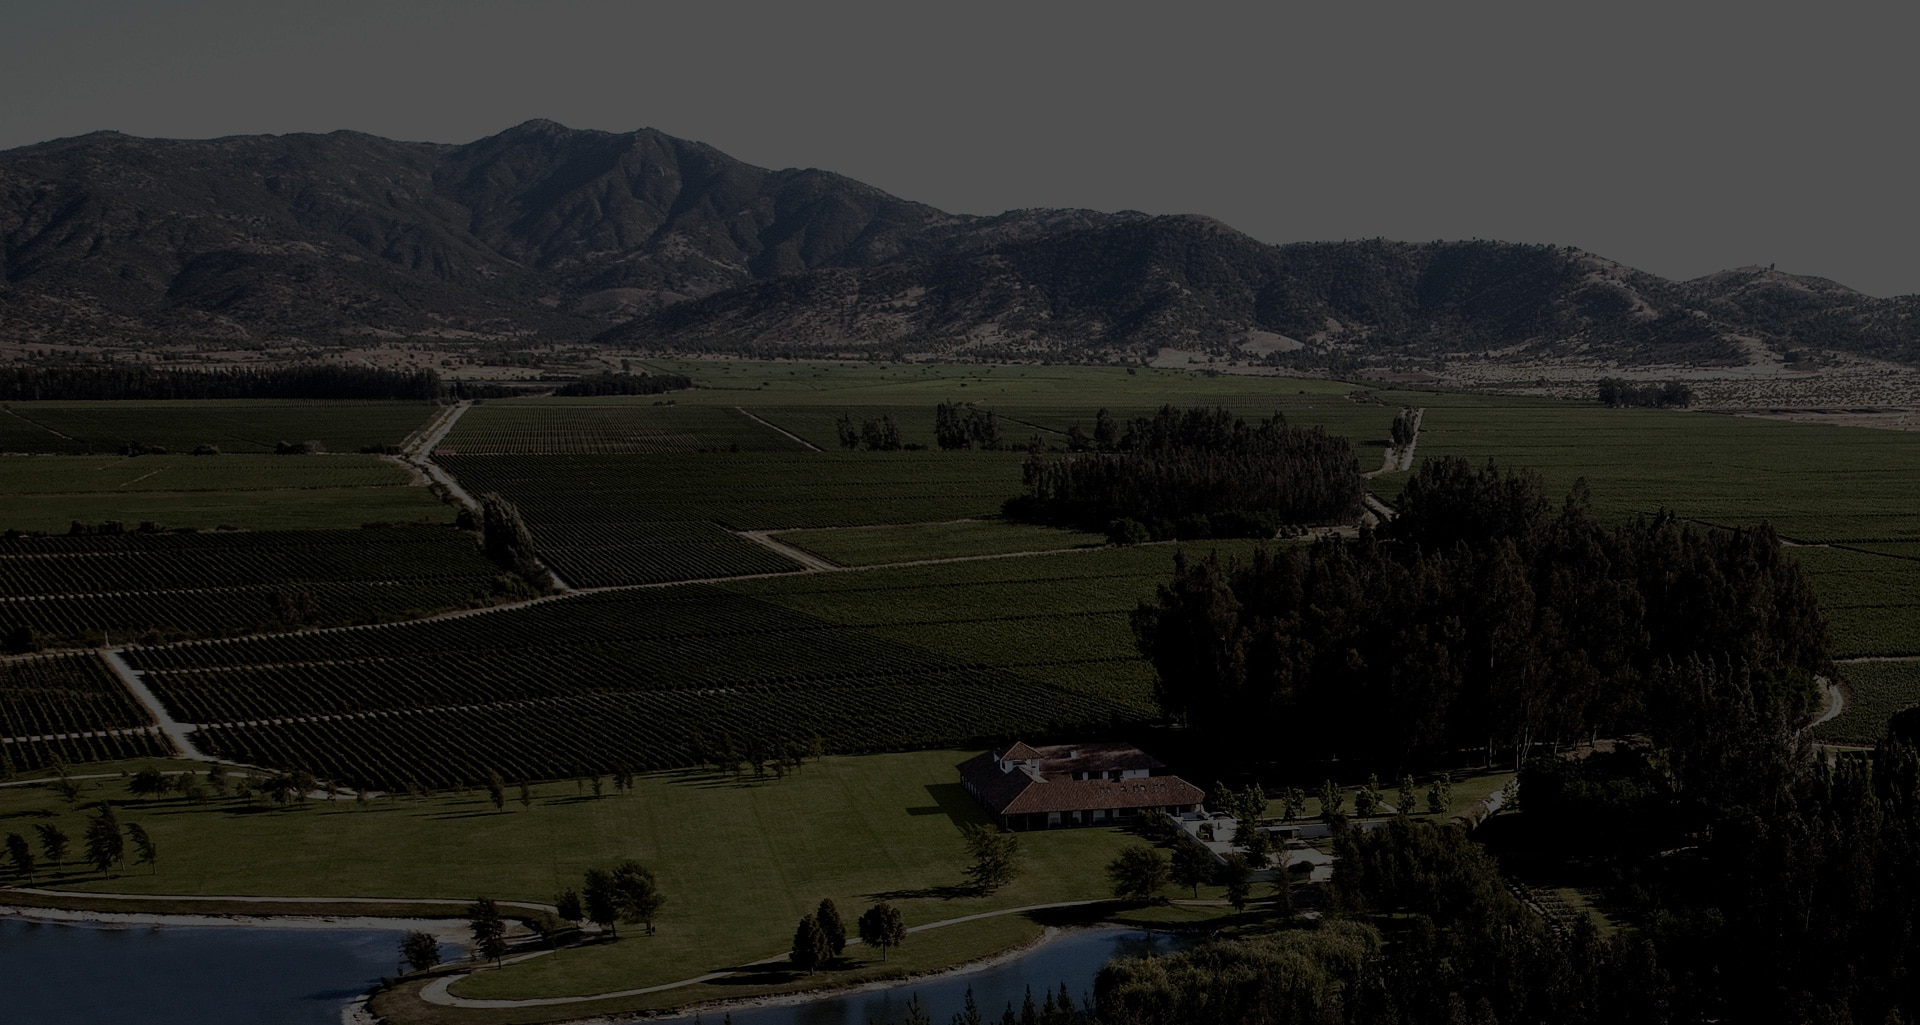 Les Domaines Los Vascos